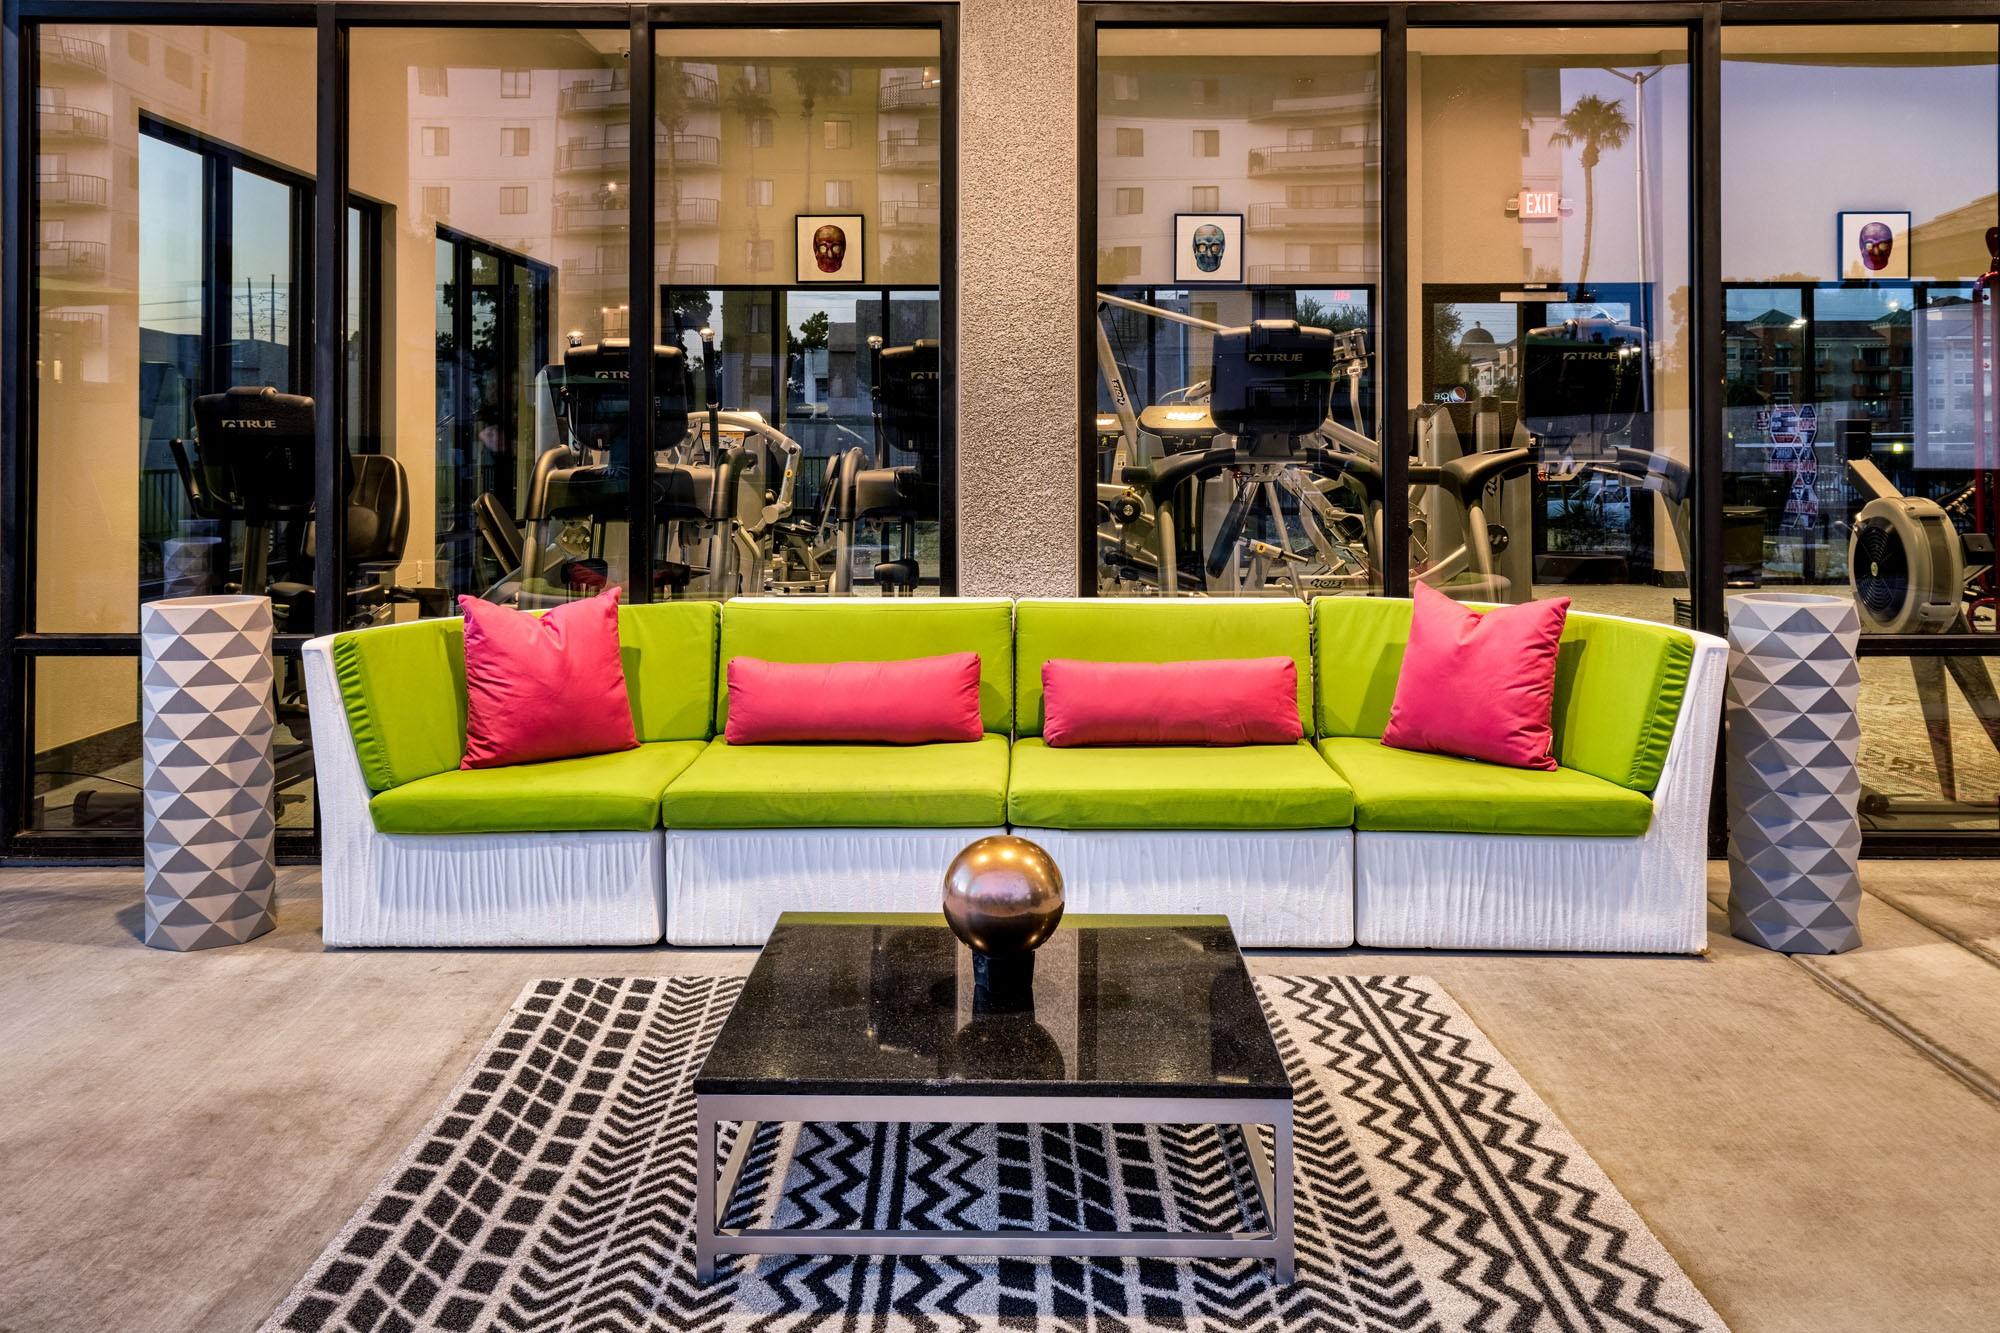 Prime Apartments rental